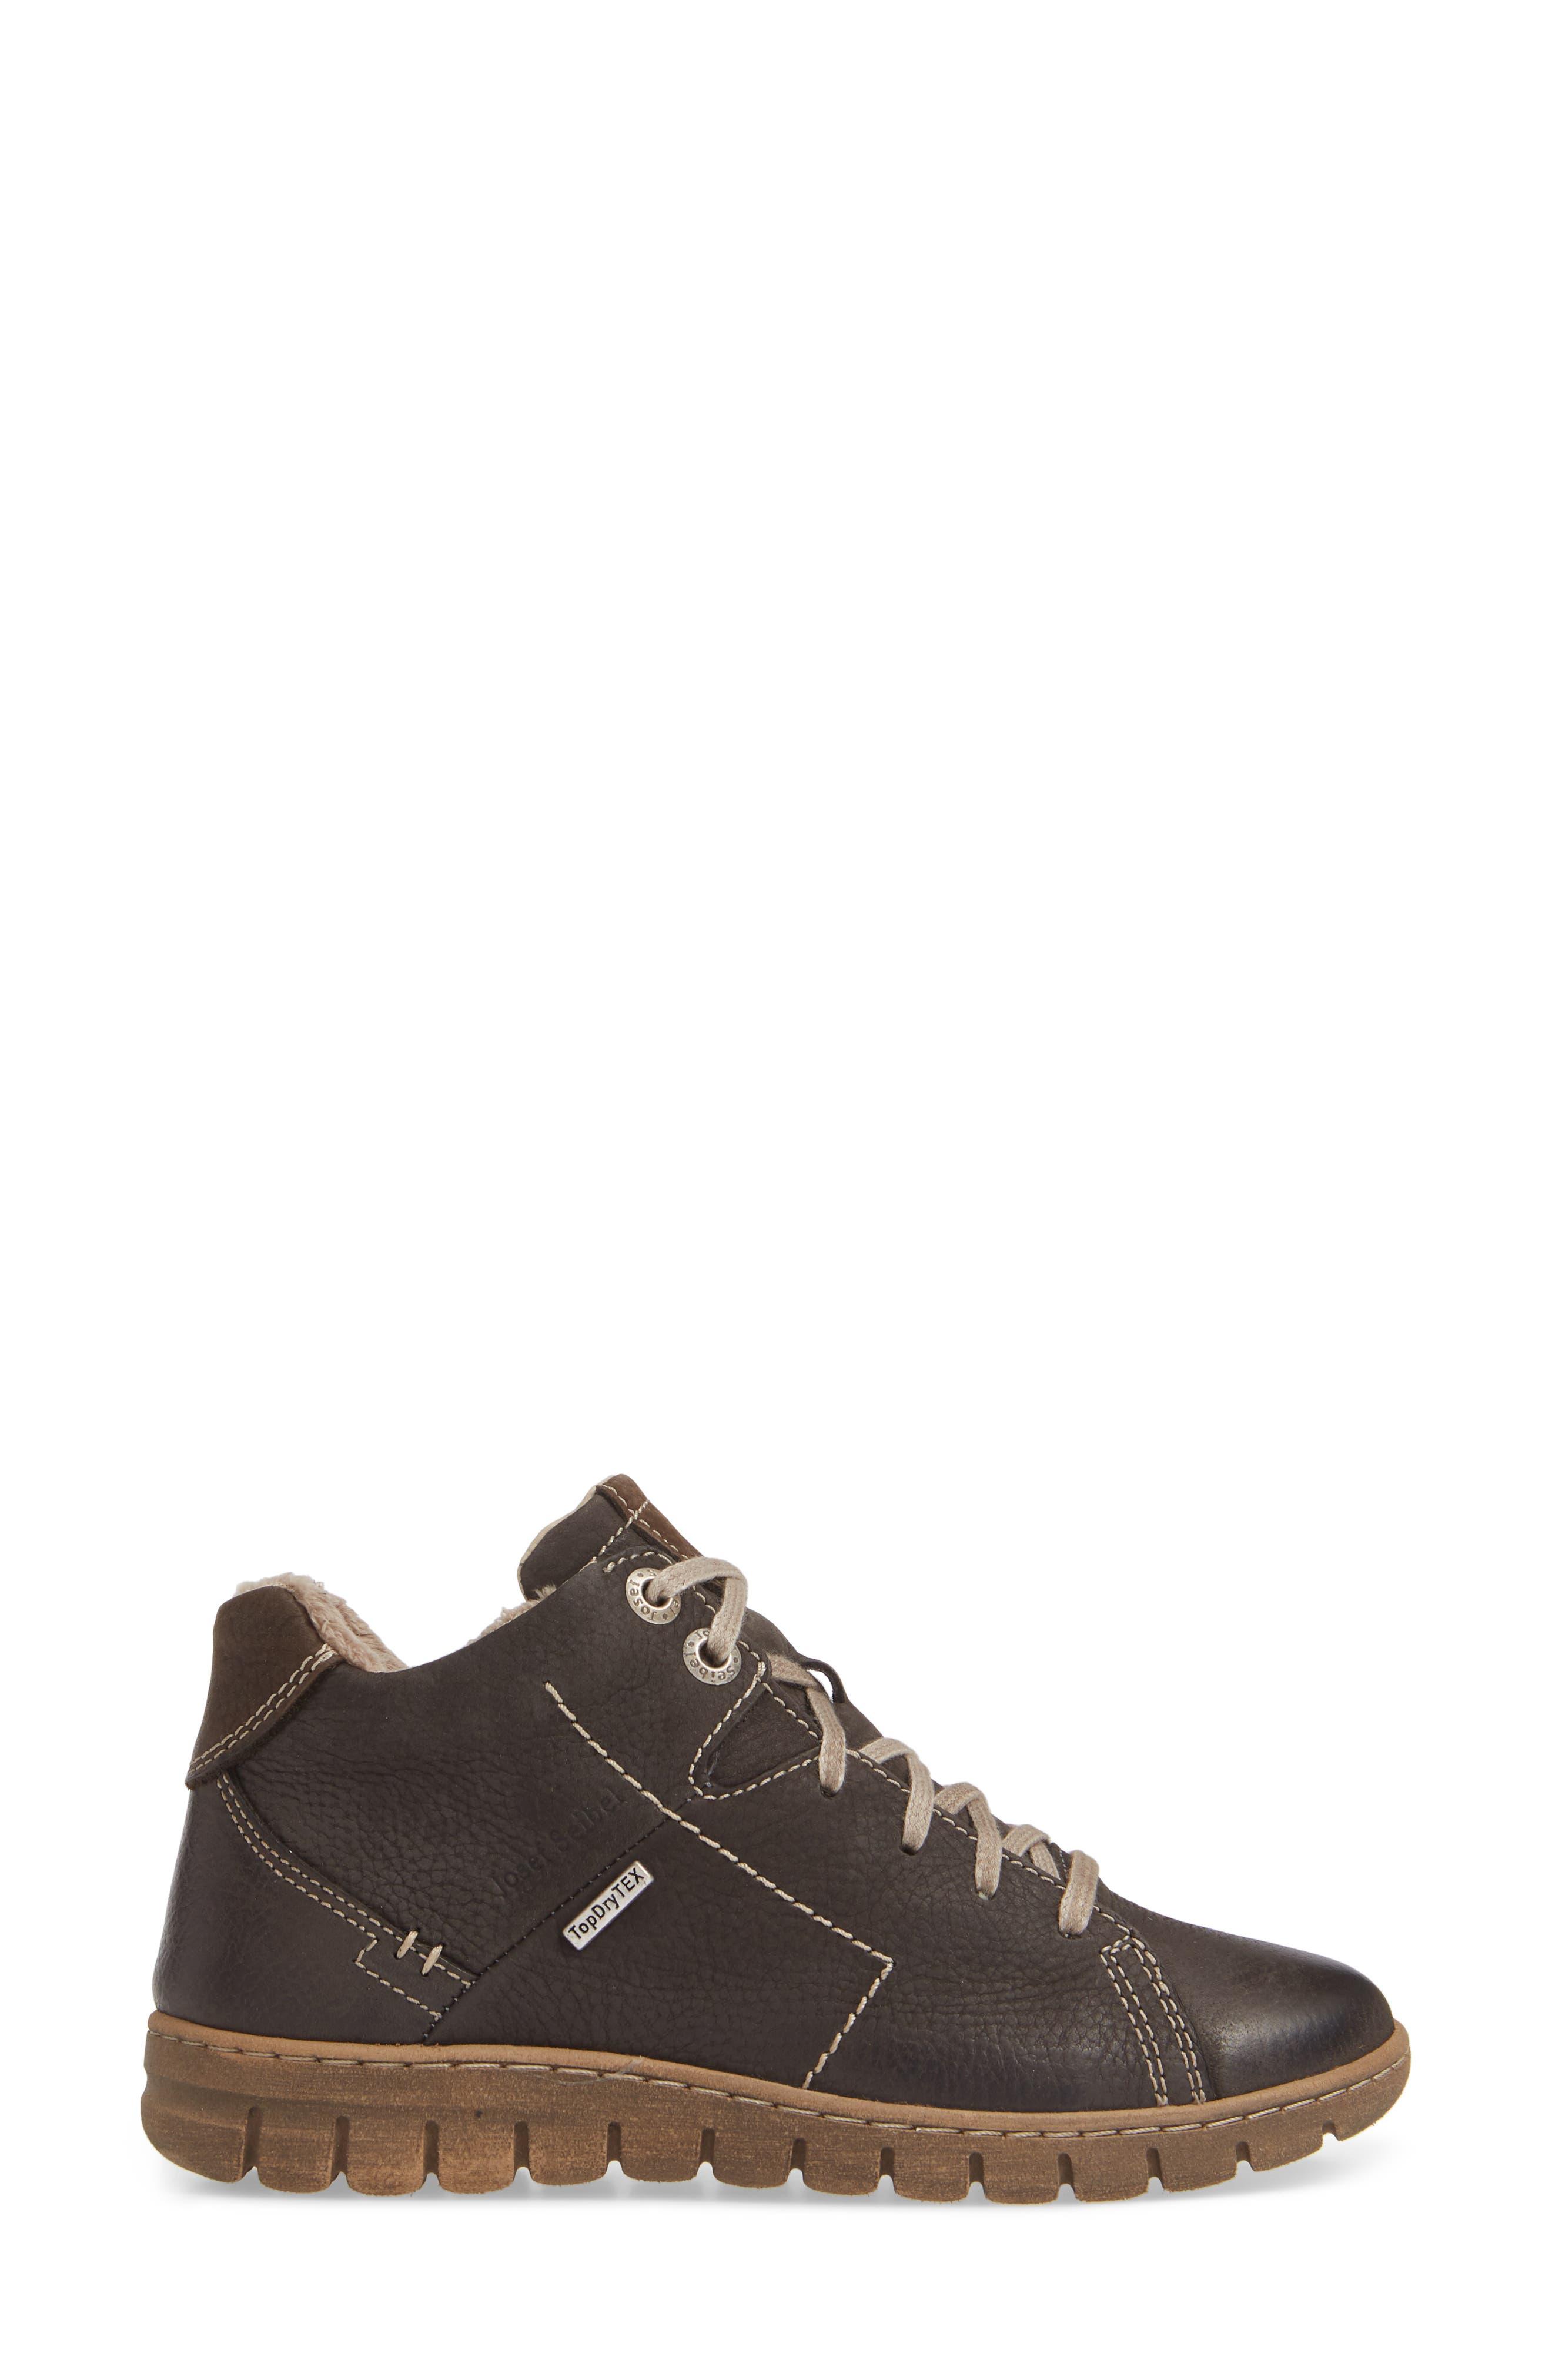 Steffi 58 Sneaker Bootie,                             Alternate thumbnail 3, color,                             TITAN LEATHER